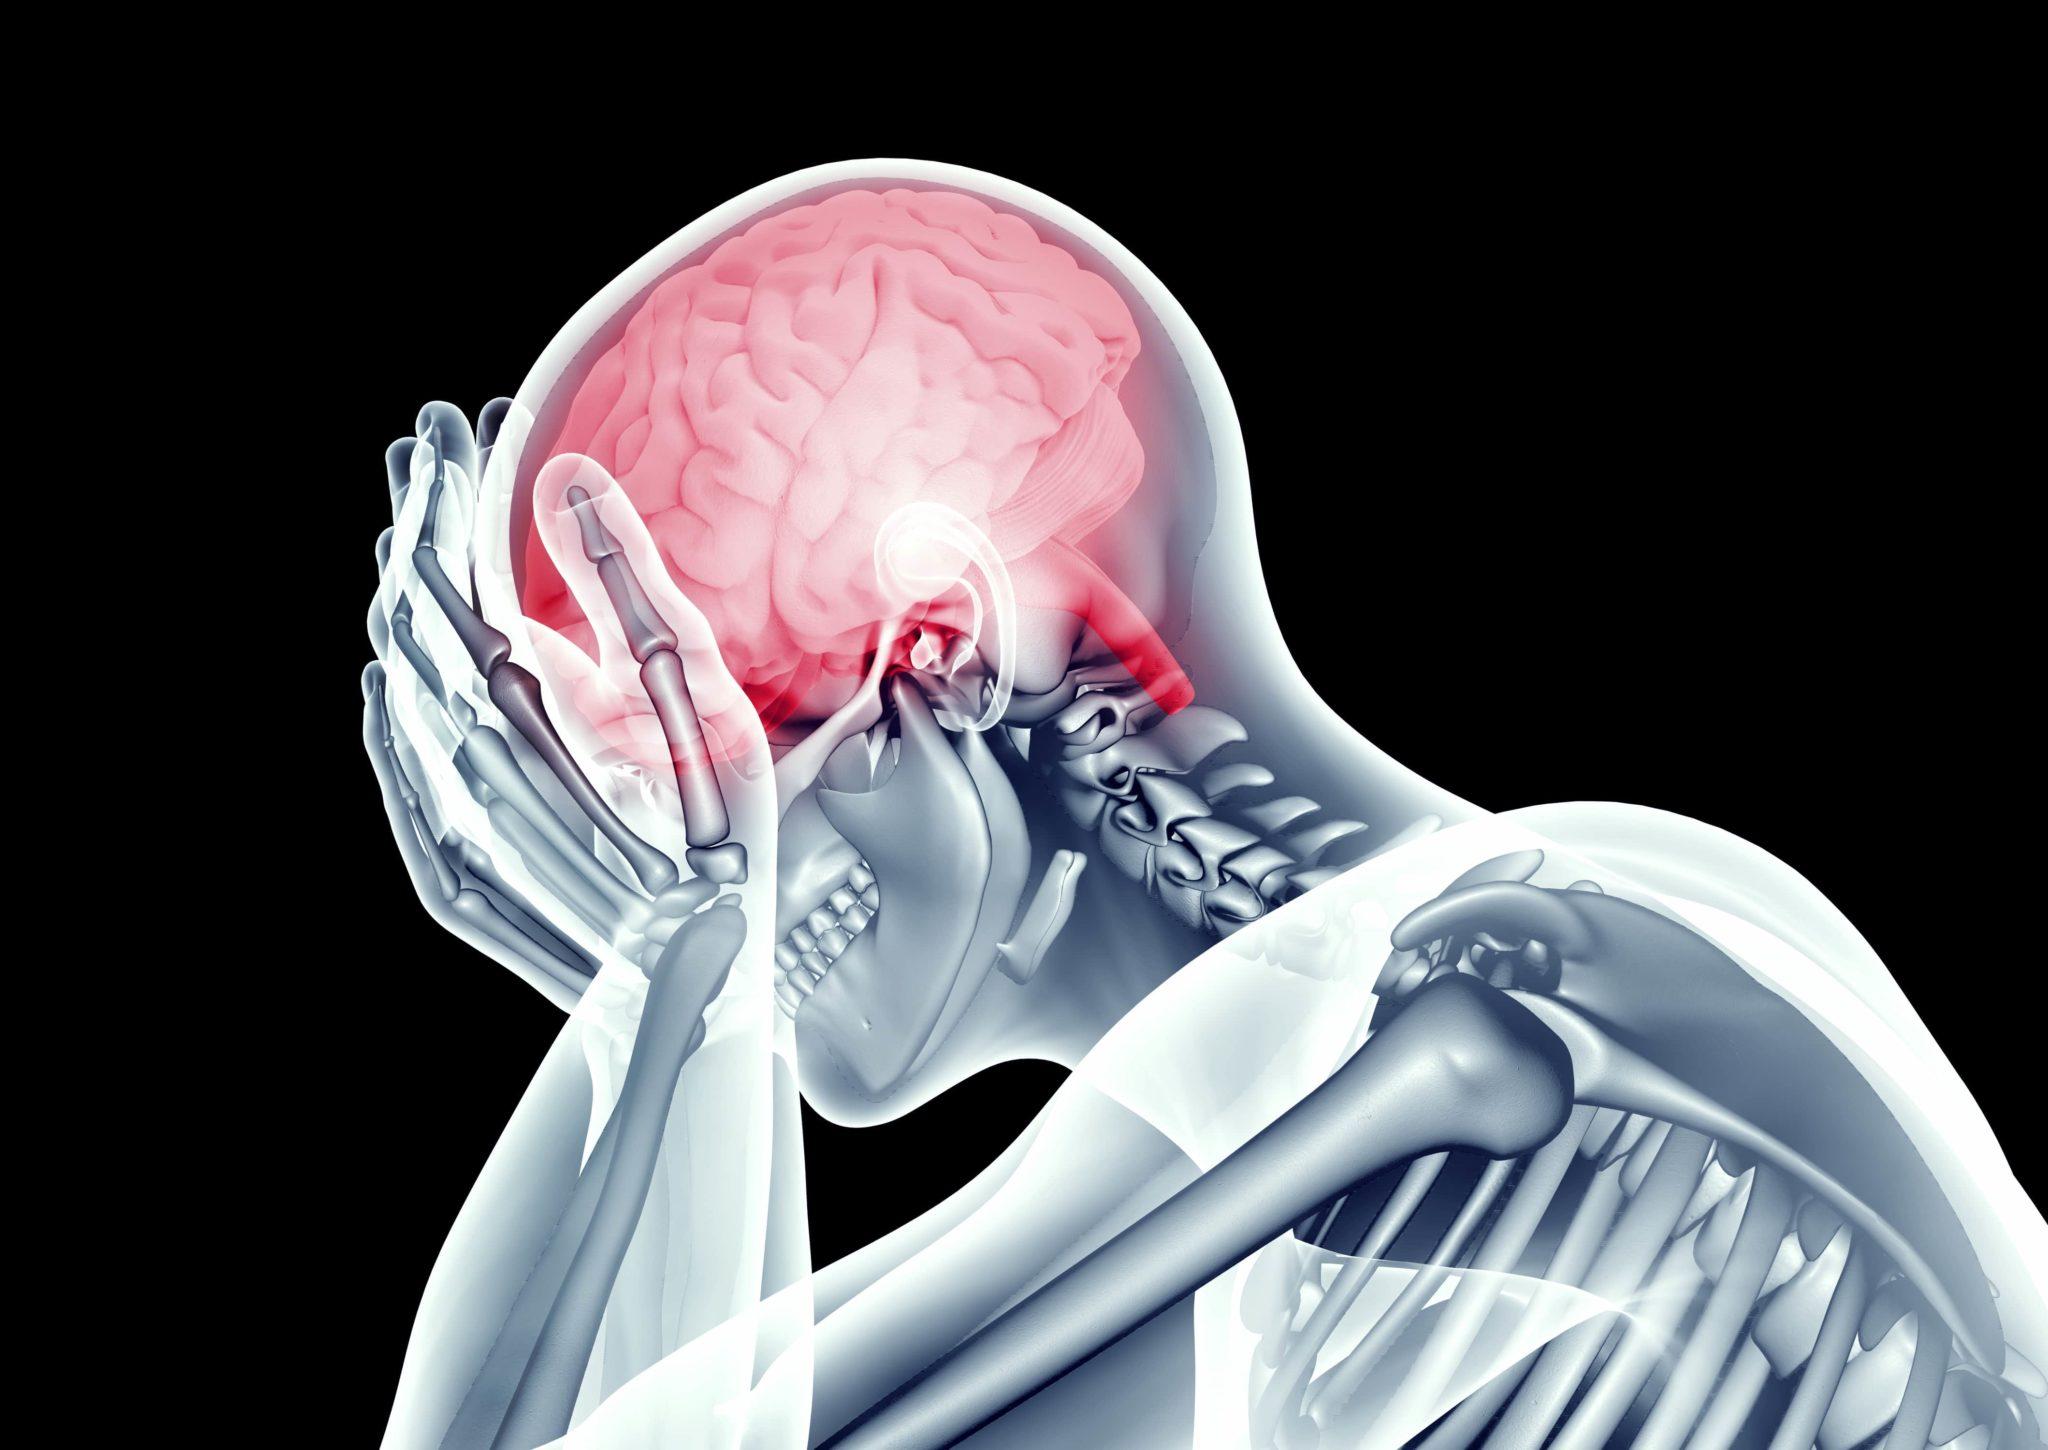 Blood Brain Barrier Permeability Testing 4